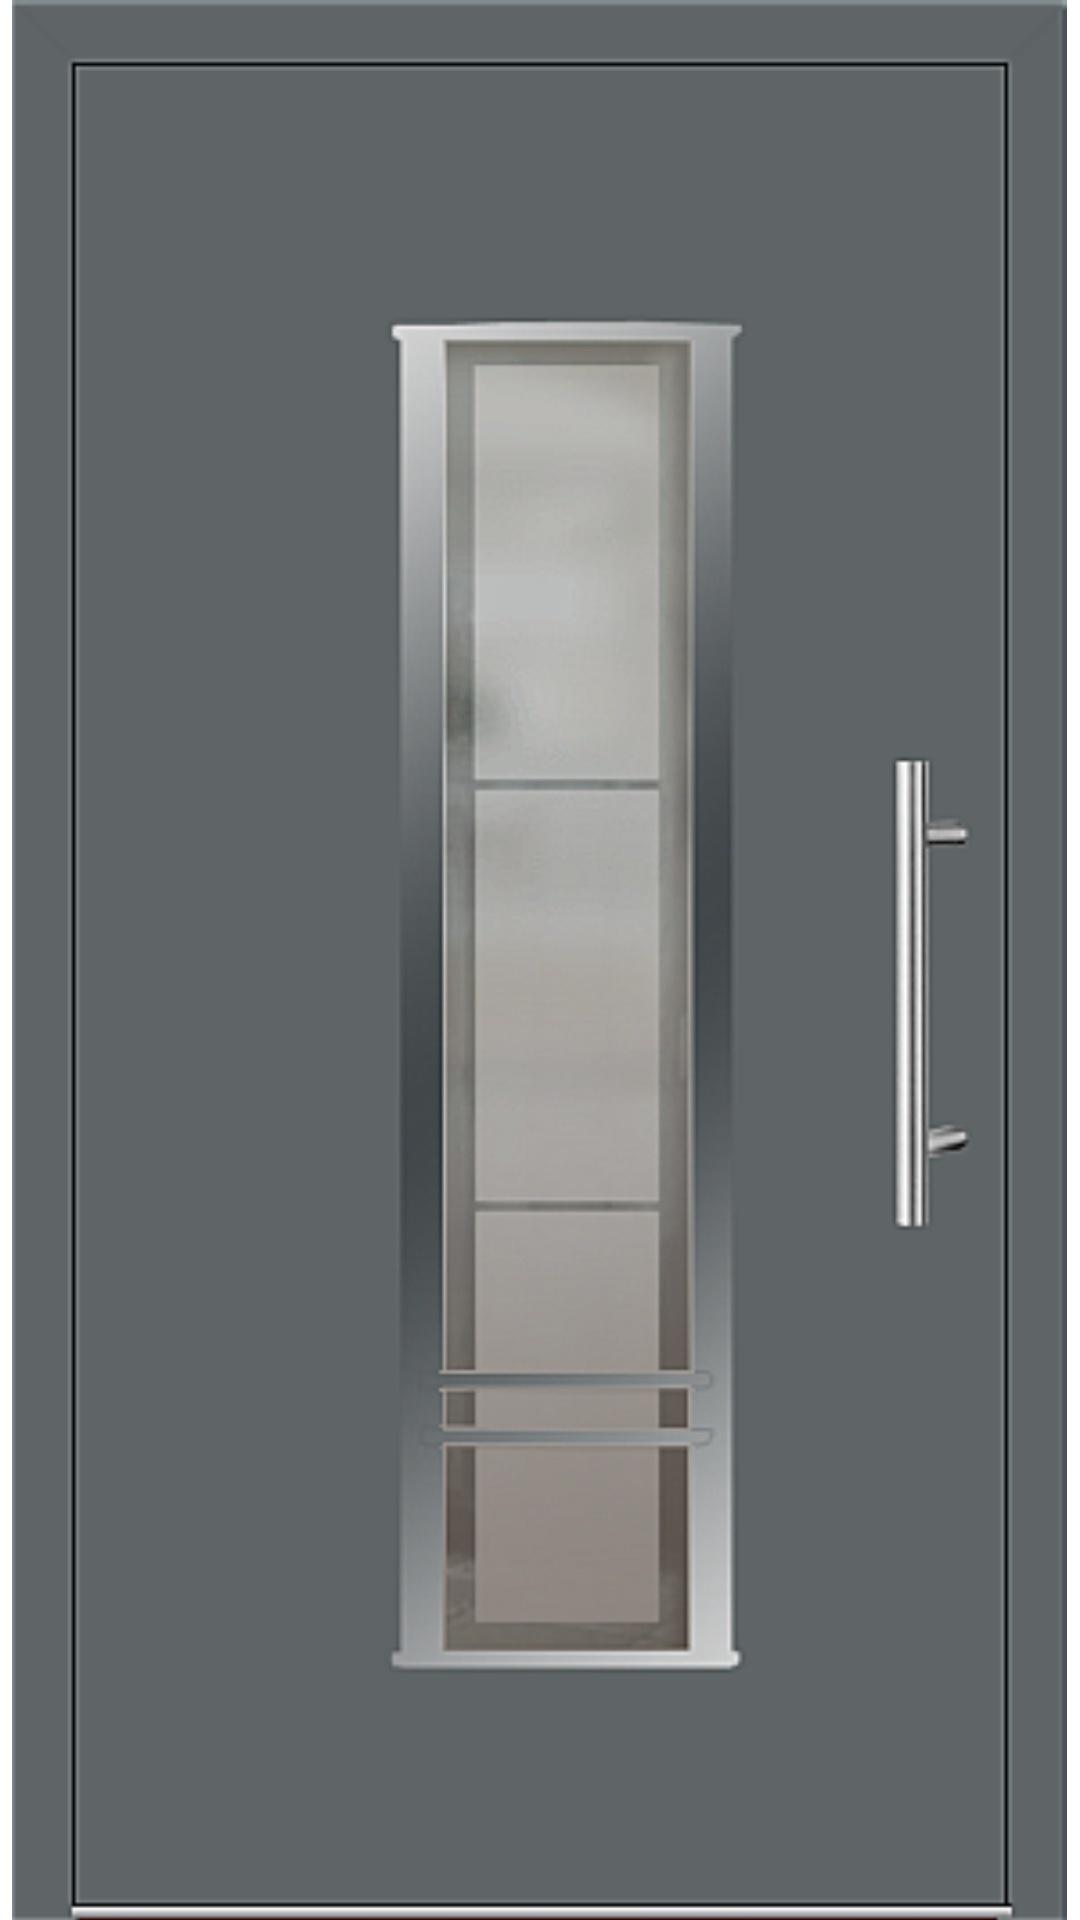 Kunststoff Haustür Modell 6817-79 basaltgrau